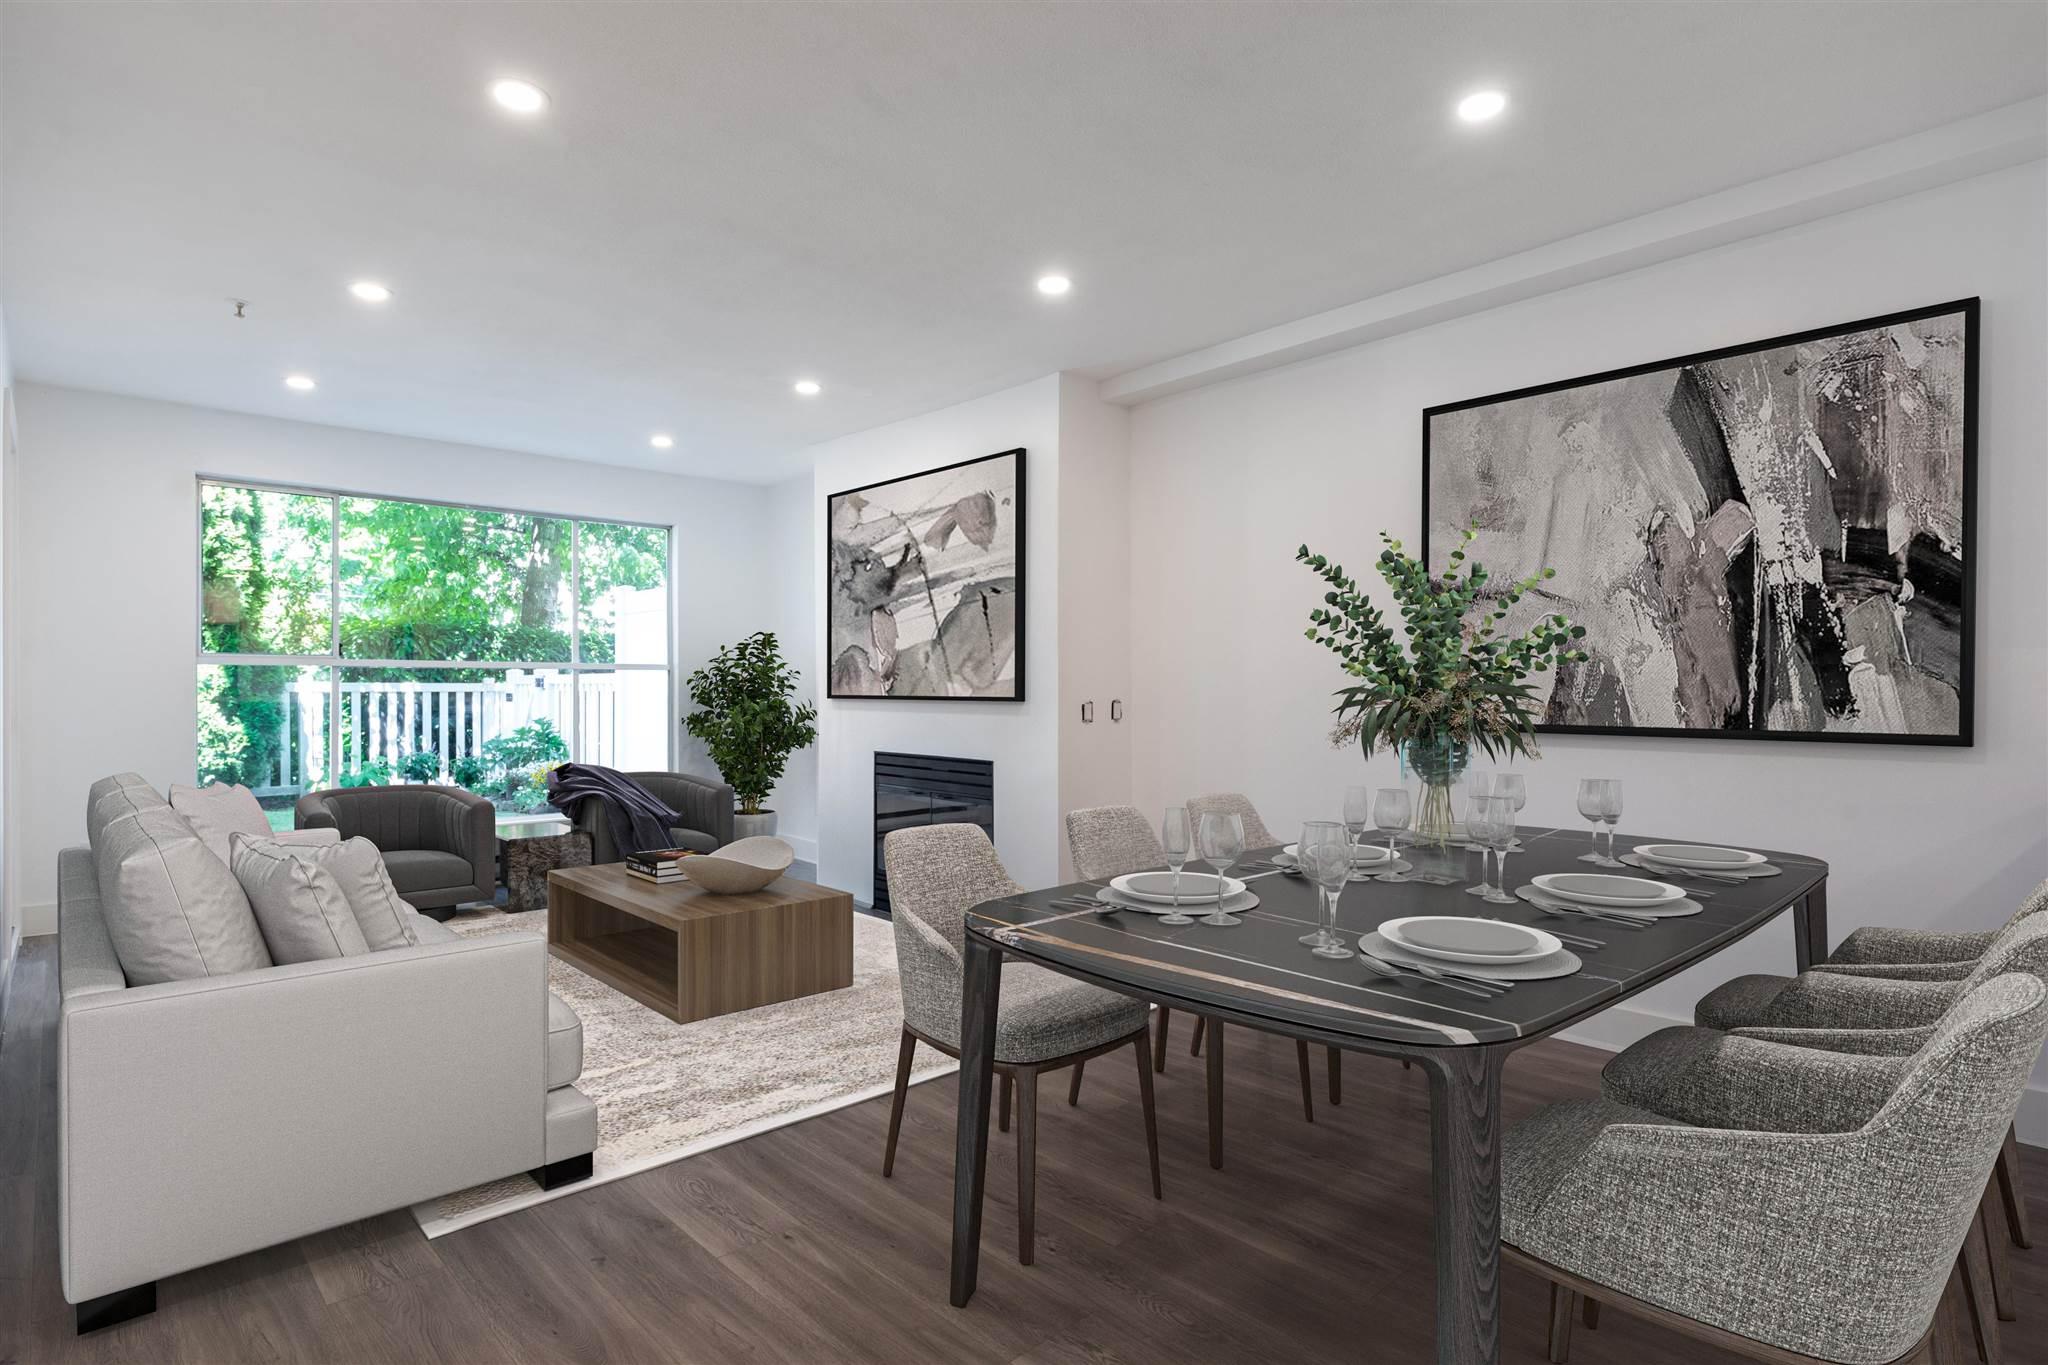 124 8880 JONES ROAD - Brighouse South Apartment/Condo for sale, 1 Bedroom (R2601121)